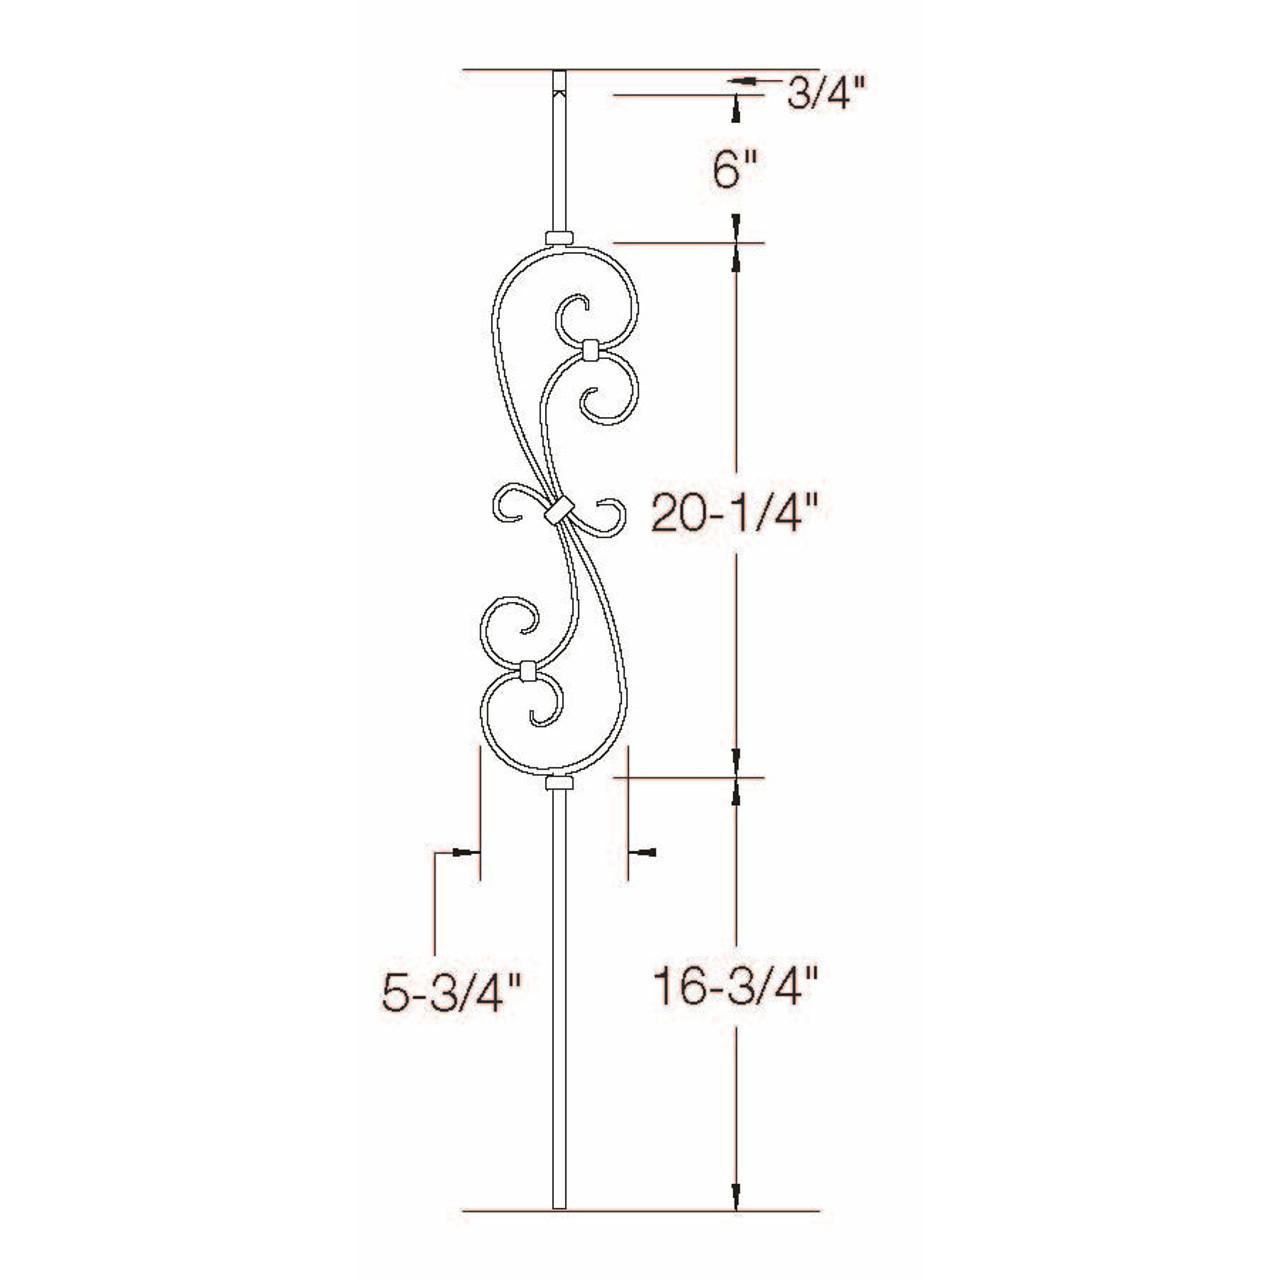 2G56 16mm S-Scroll, Tubular Steel Dimensional Information